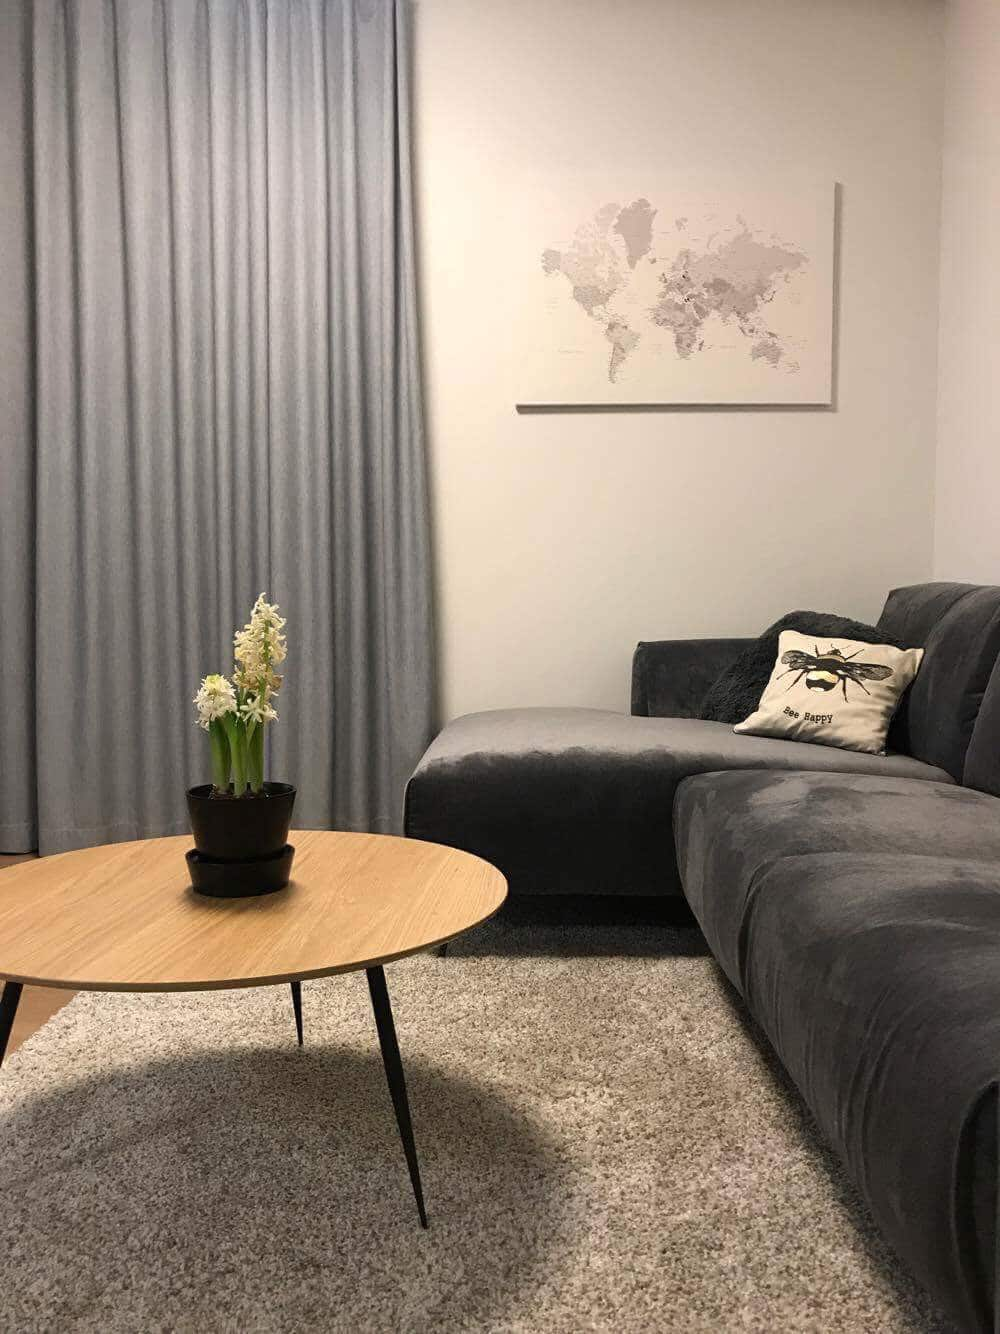 worl map living room decor